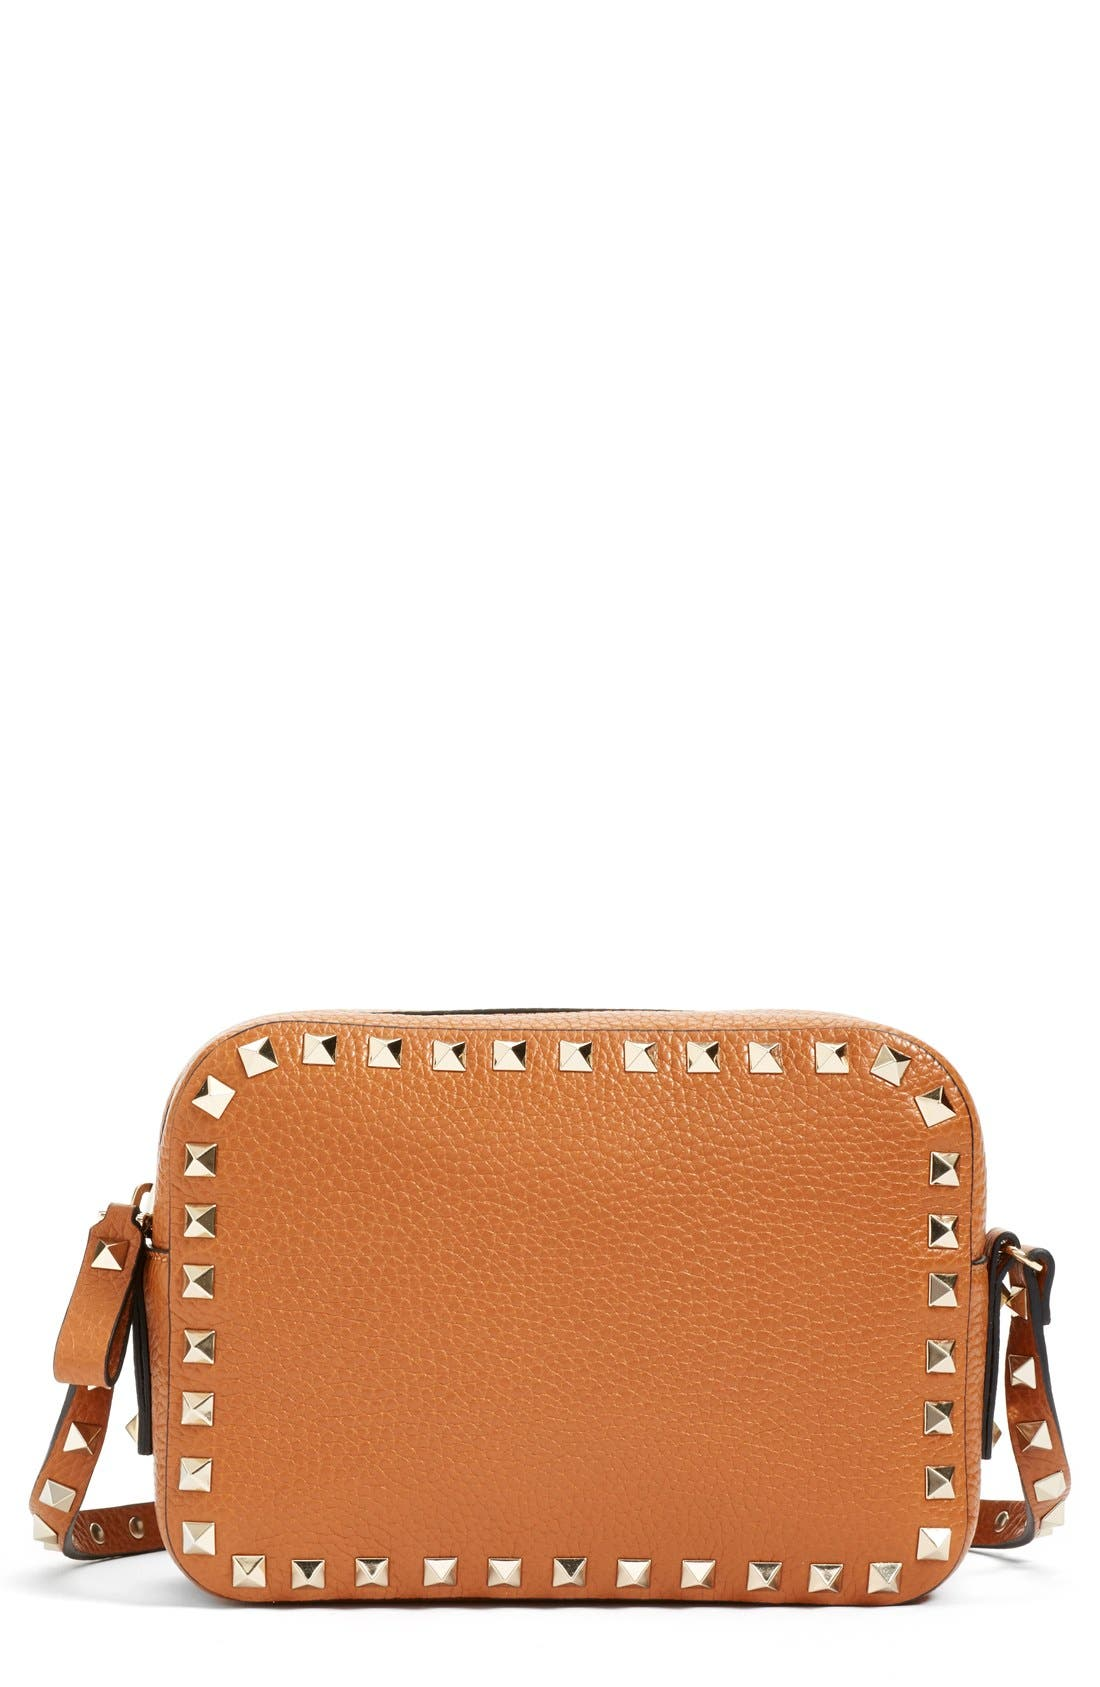 Main Image - Valentino 'Rockstud - Alce' Calfskin Leather Camera Crossbody Bag